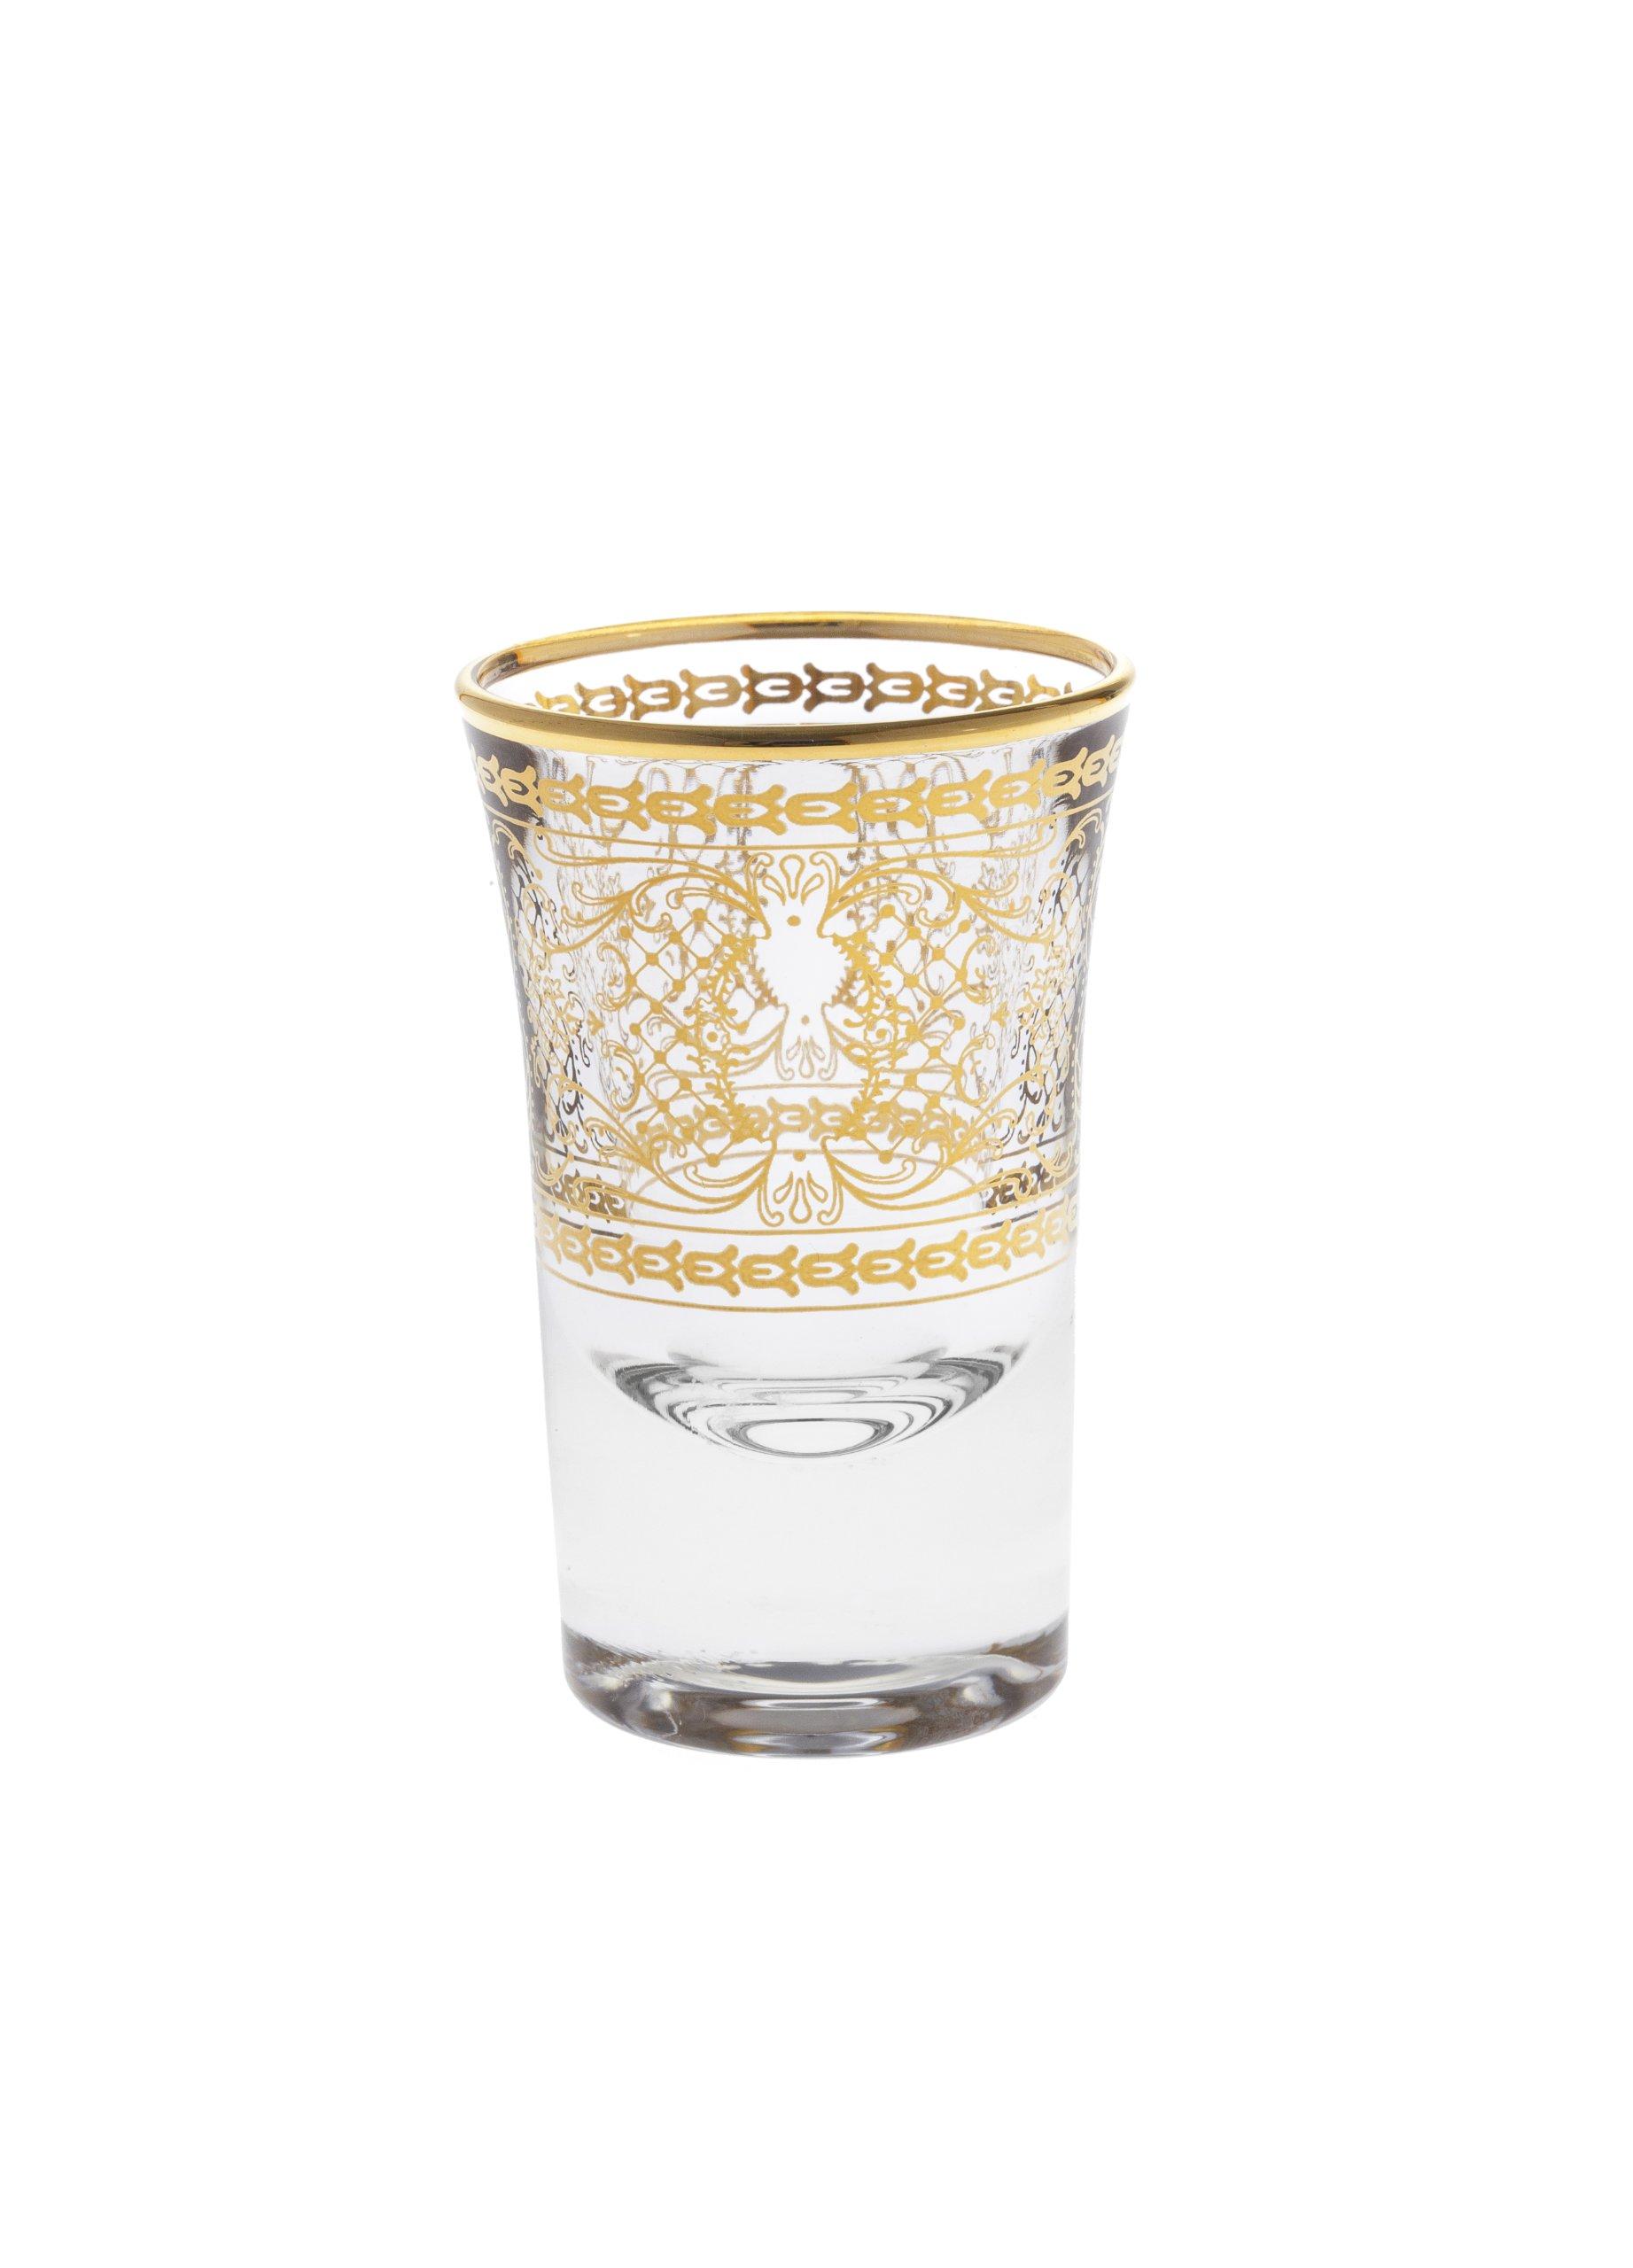 Rose's Glassware Fine Italian Liquor Cup Shotglass Set - 14 Karat GoldDesign - Set of 6 by Rose's Glassware (Image #2)